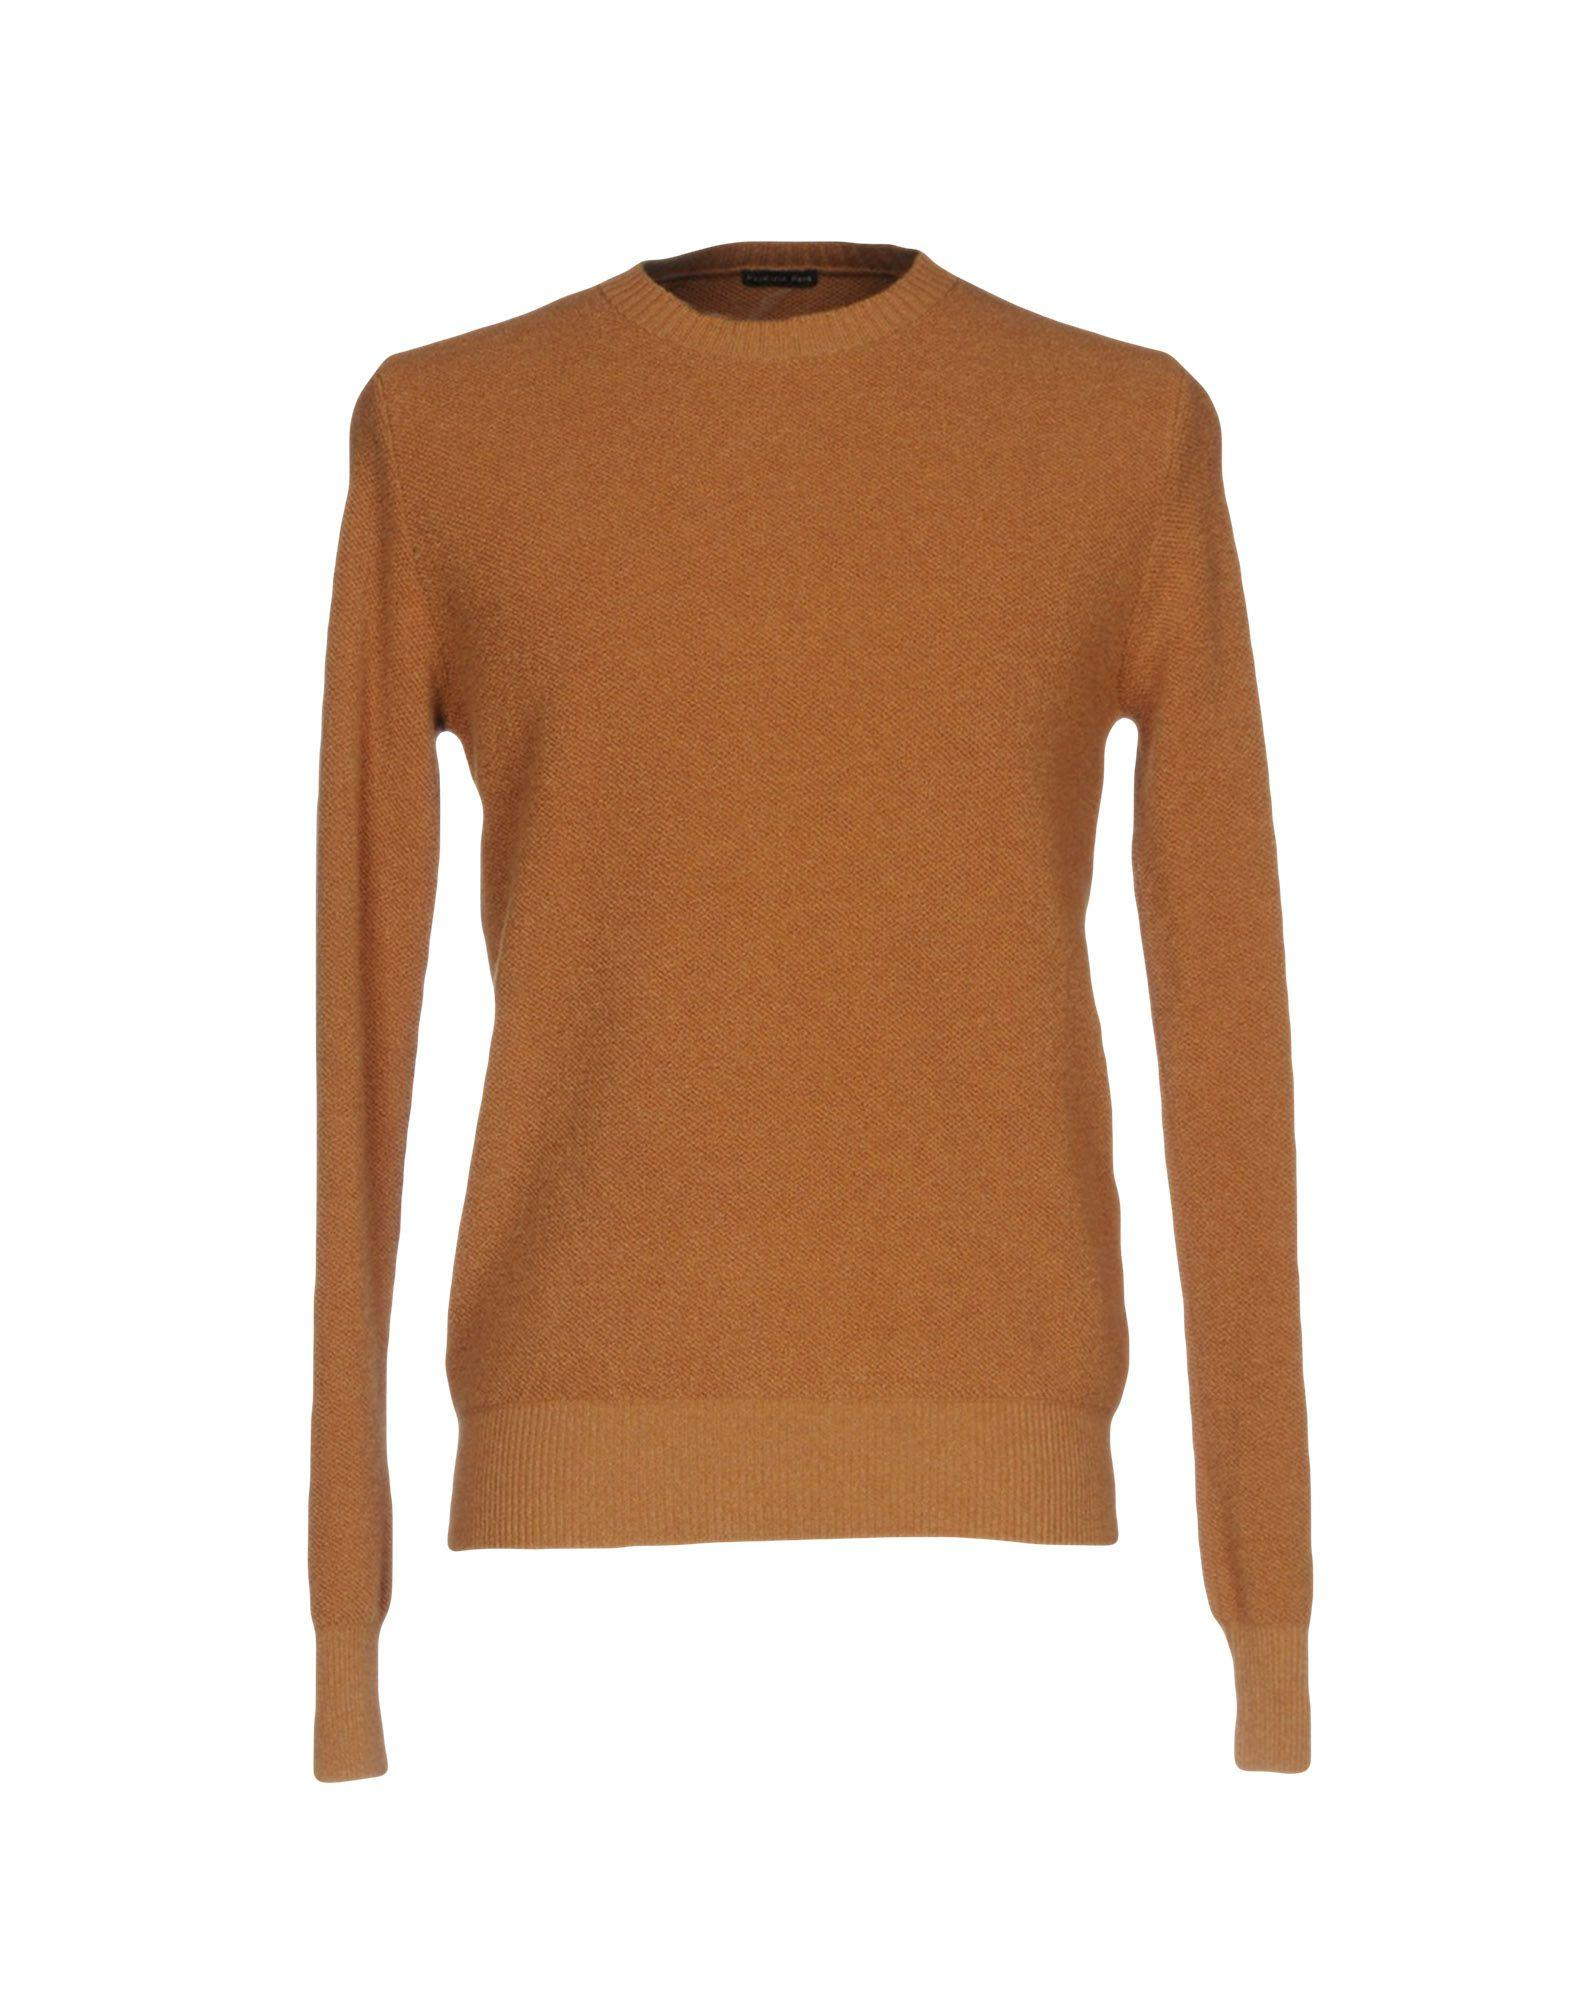 Patrizia Pepe Sweaters In Camel